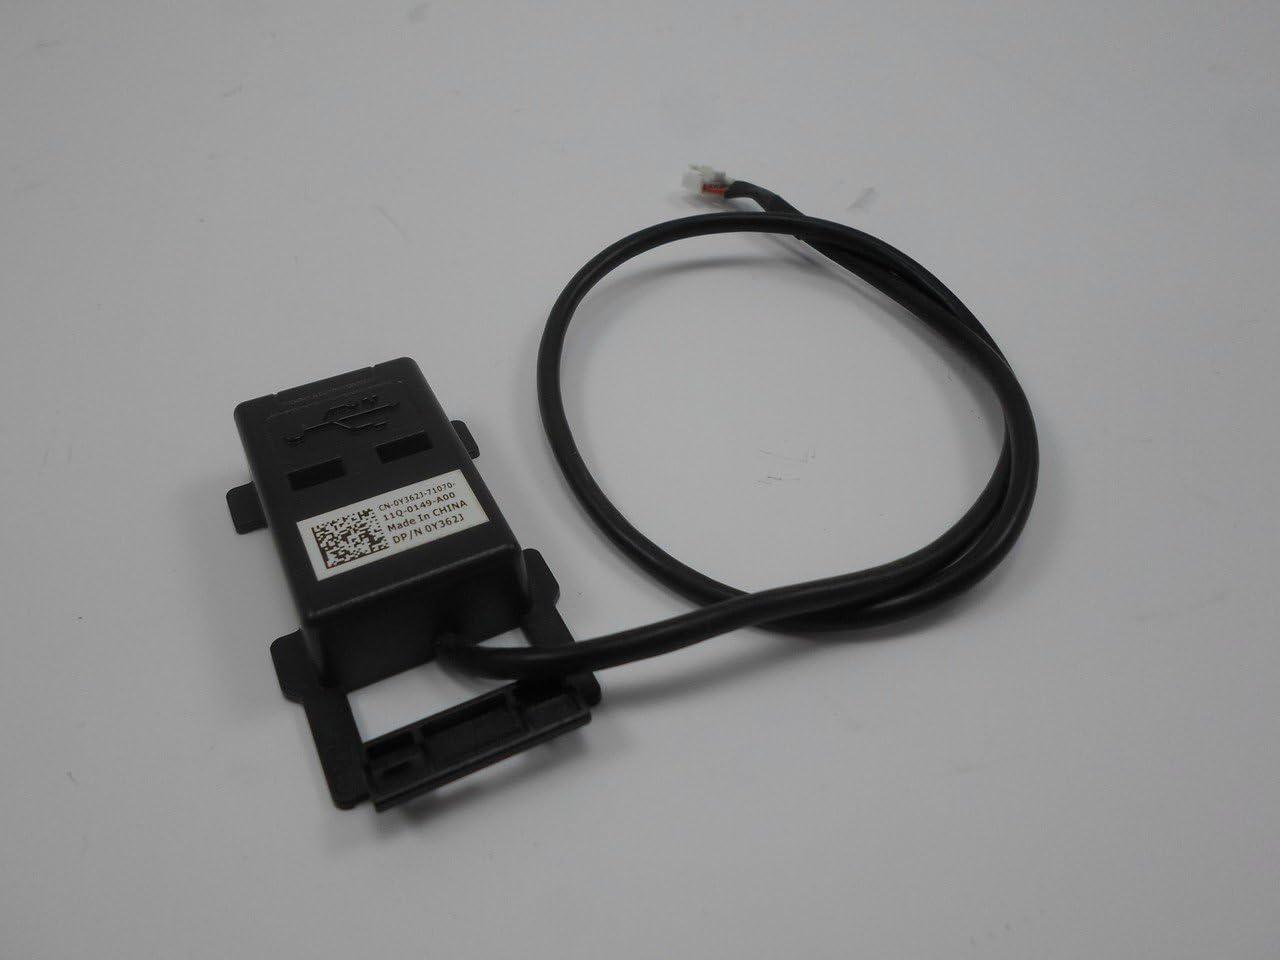 Dell Y362J - Internal USB Key W/Bracket & Cable Poweredge T610